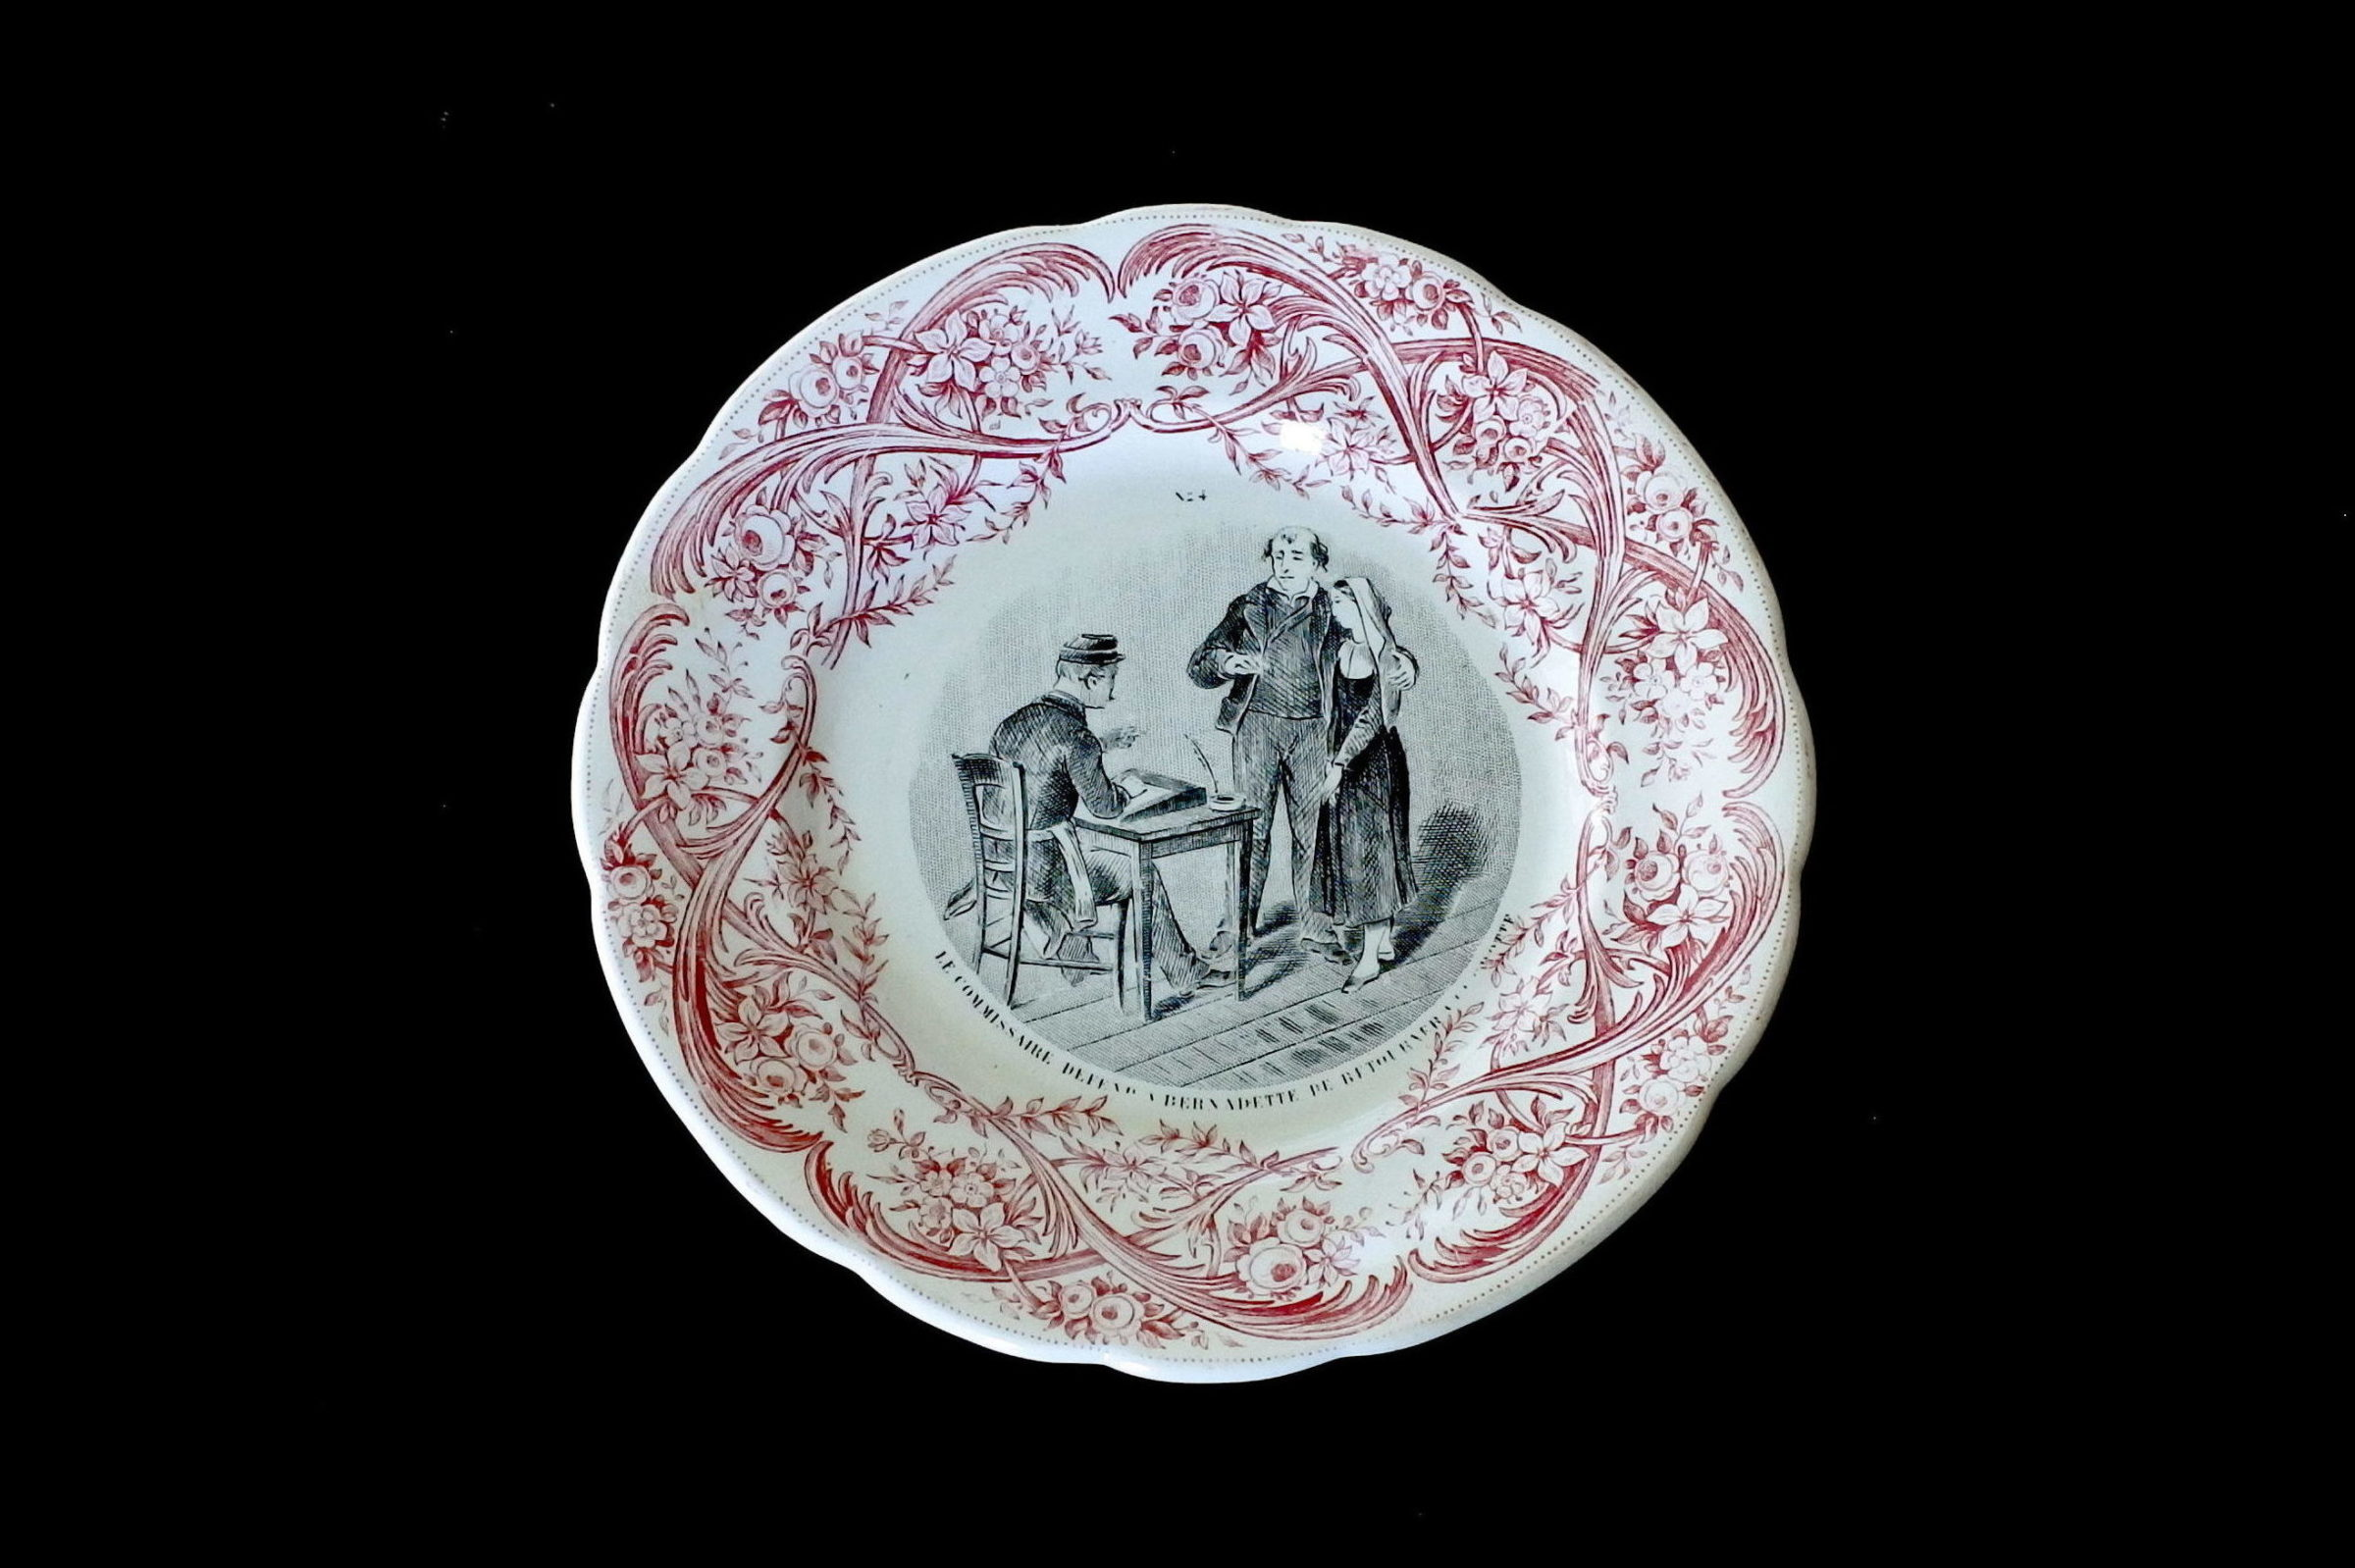 Serie completa di 12 piatti in ceramica dedicati alla vita di Bernadette - 5